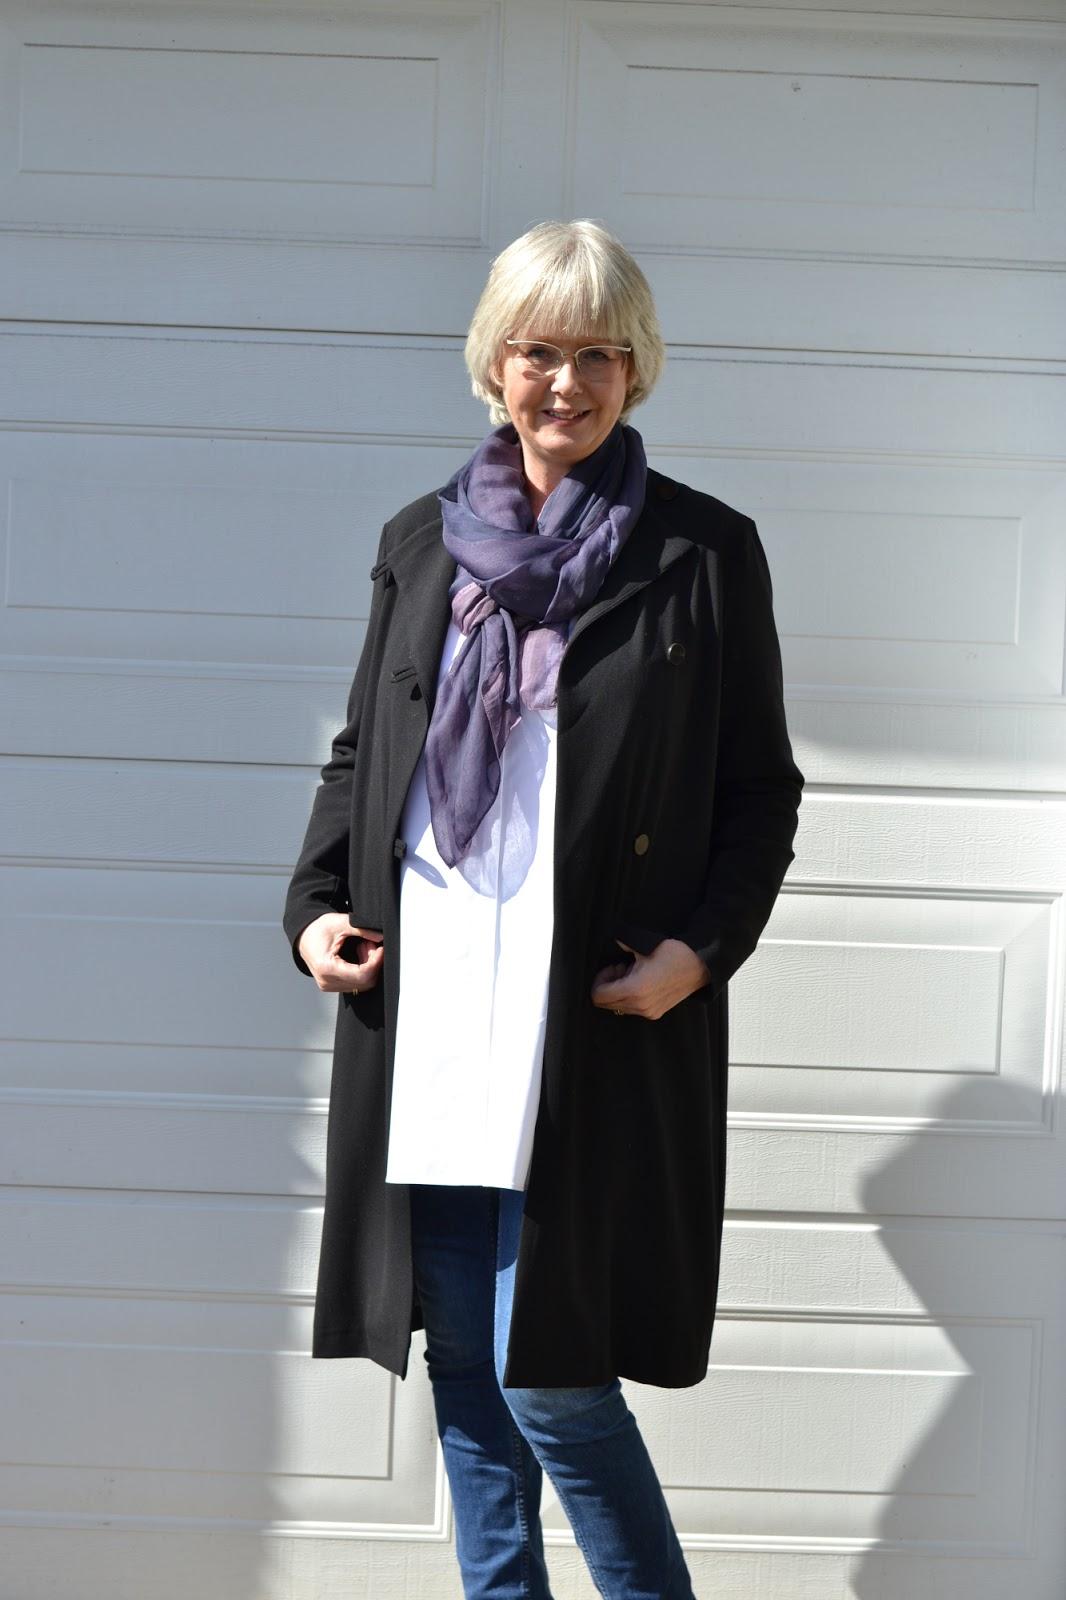 Sprintgtime coats